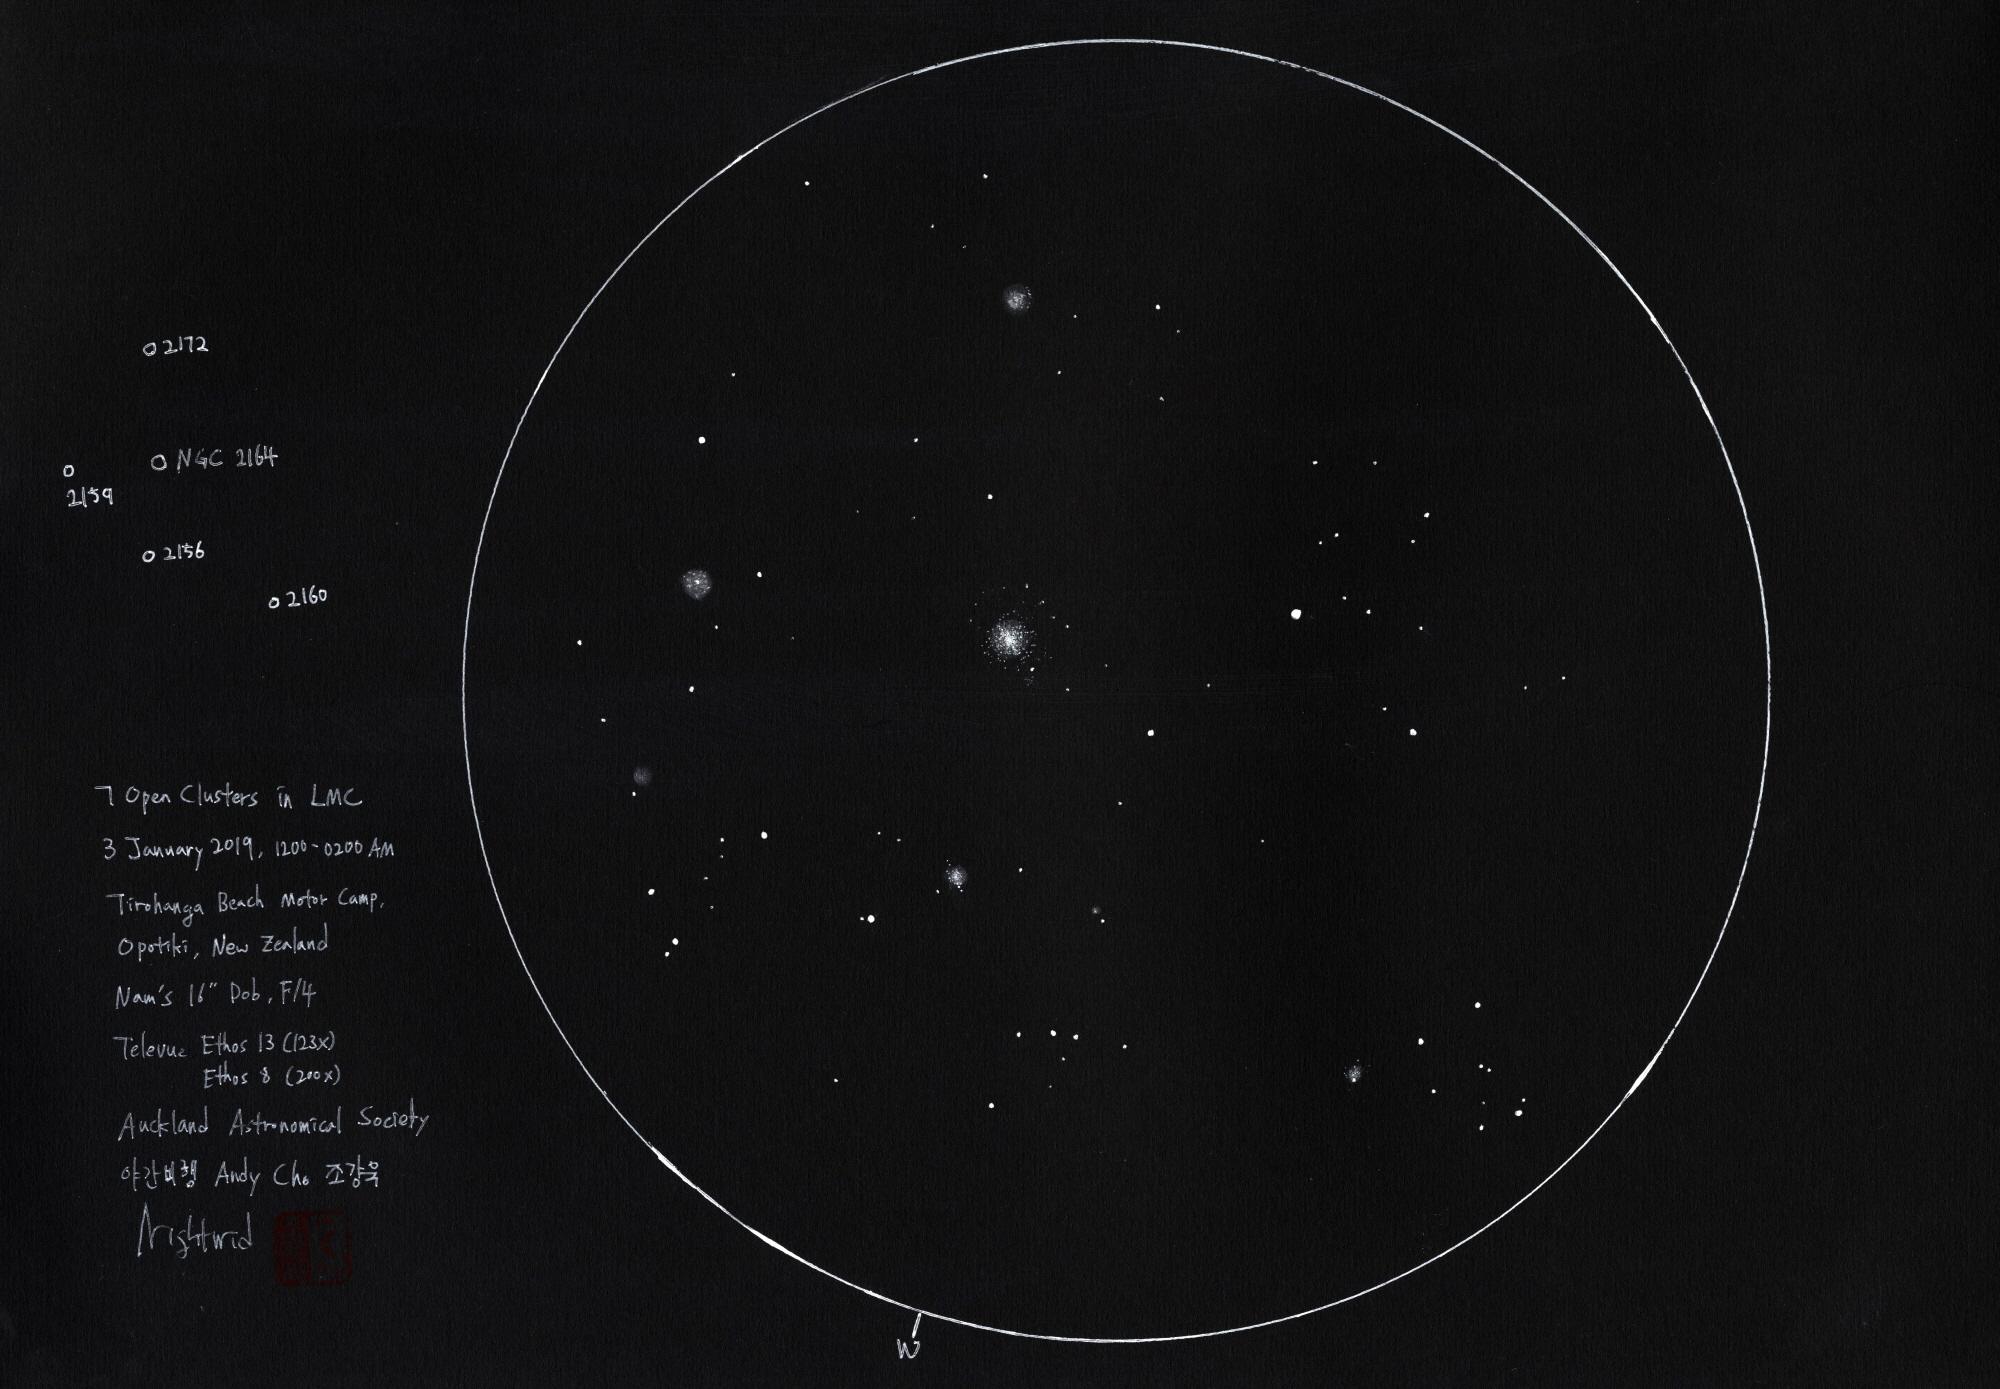 2000_NGC2164_ori_190103.jpg